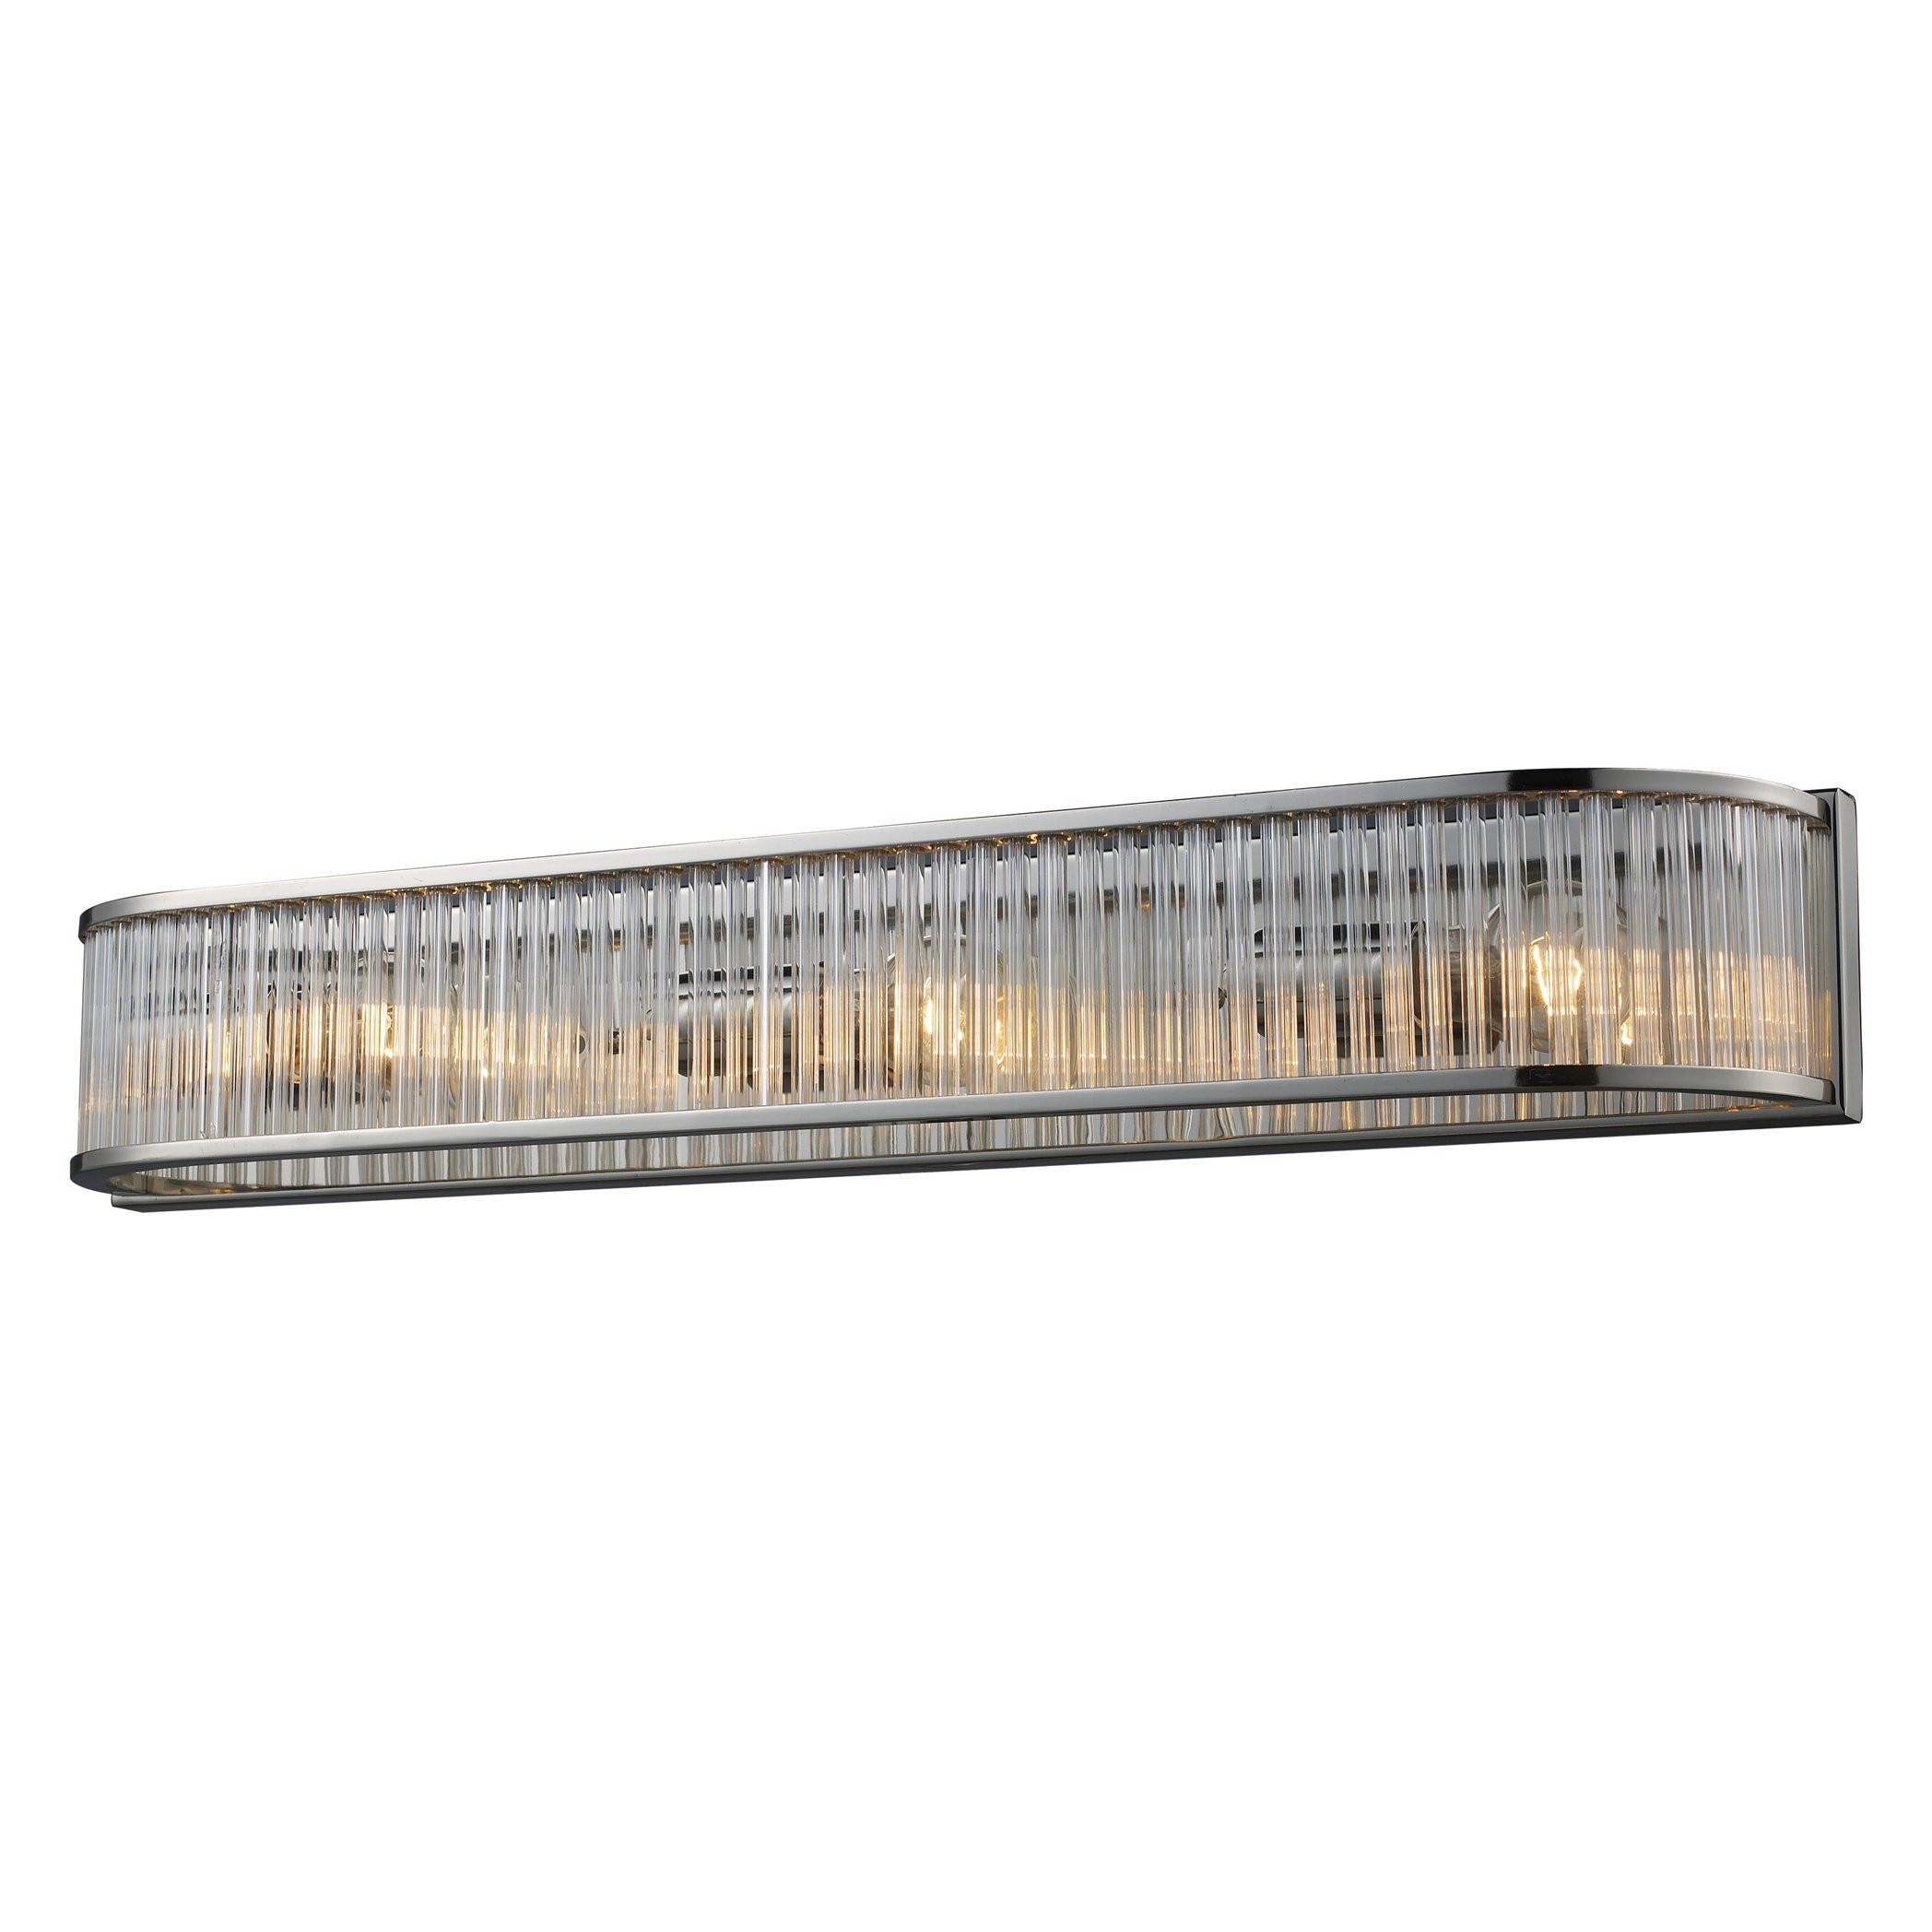 Best ideas about Bathroom Light Bar . Save or Pin Elk Lighting Braxton 3 Light Bath Bar & Reviews Now.